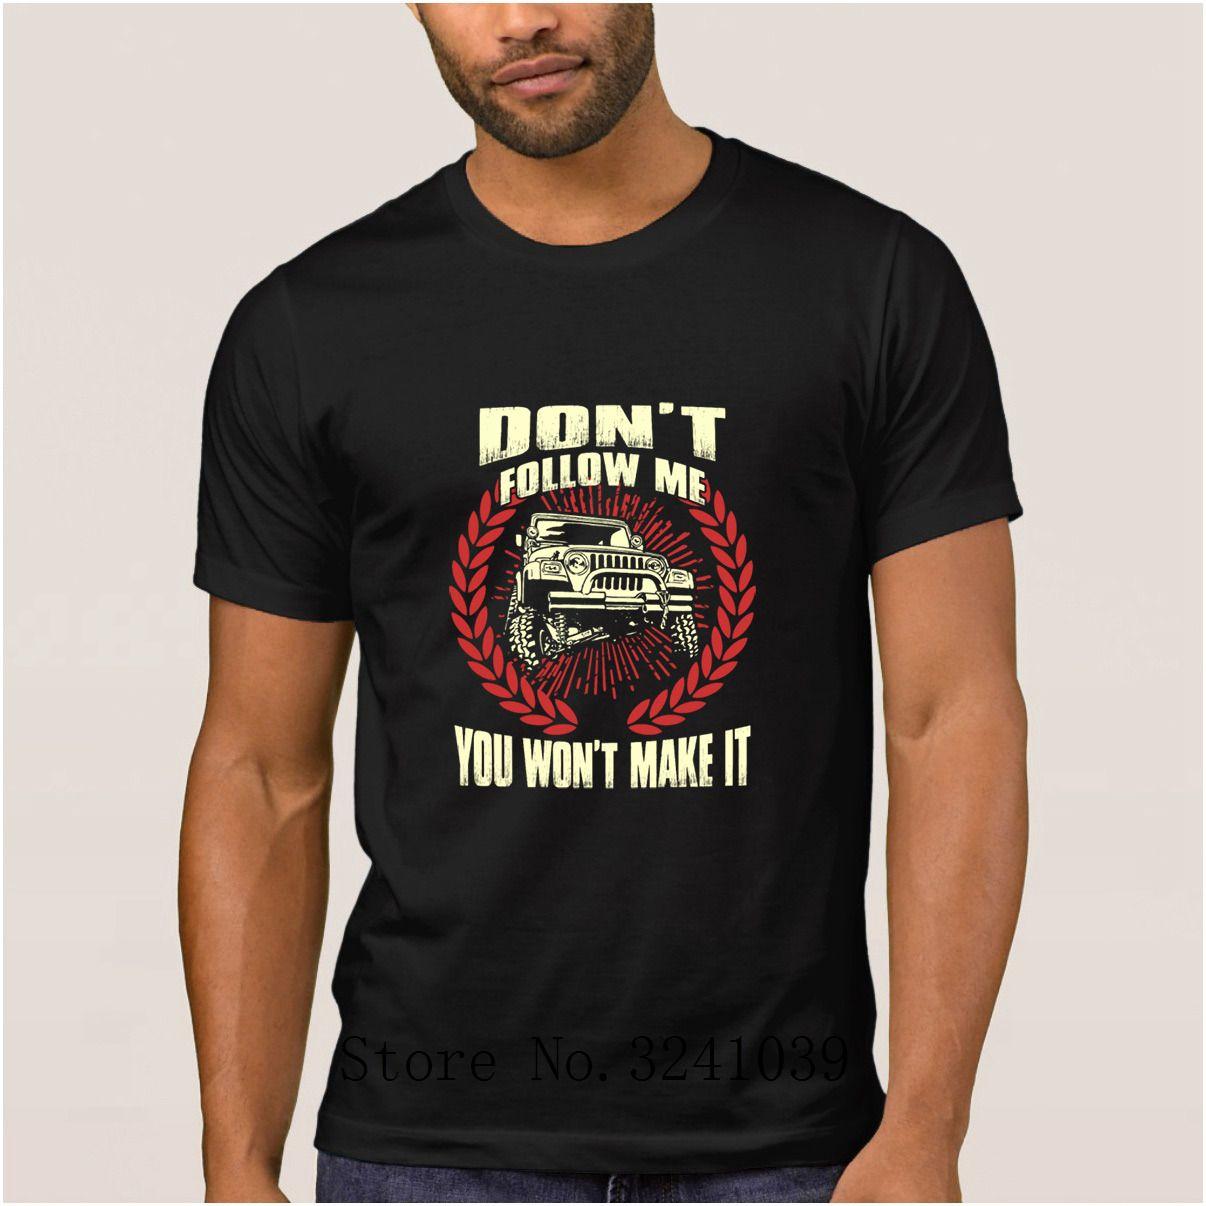 fe368bdf Casual jeep driver don't follow me you won't make it t shirt summer  Anti-Wrinkle men's t-shirt 100% cotton tee shirt men